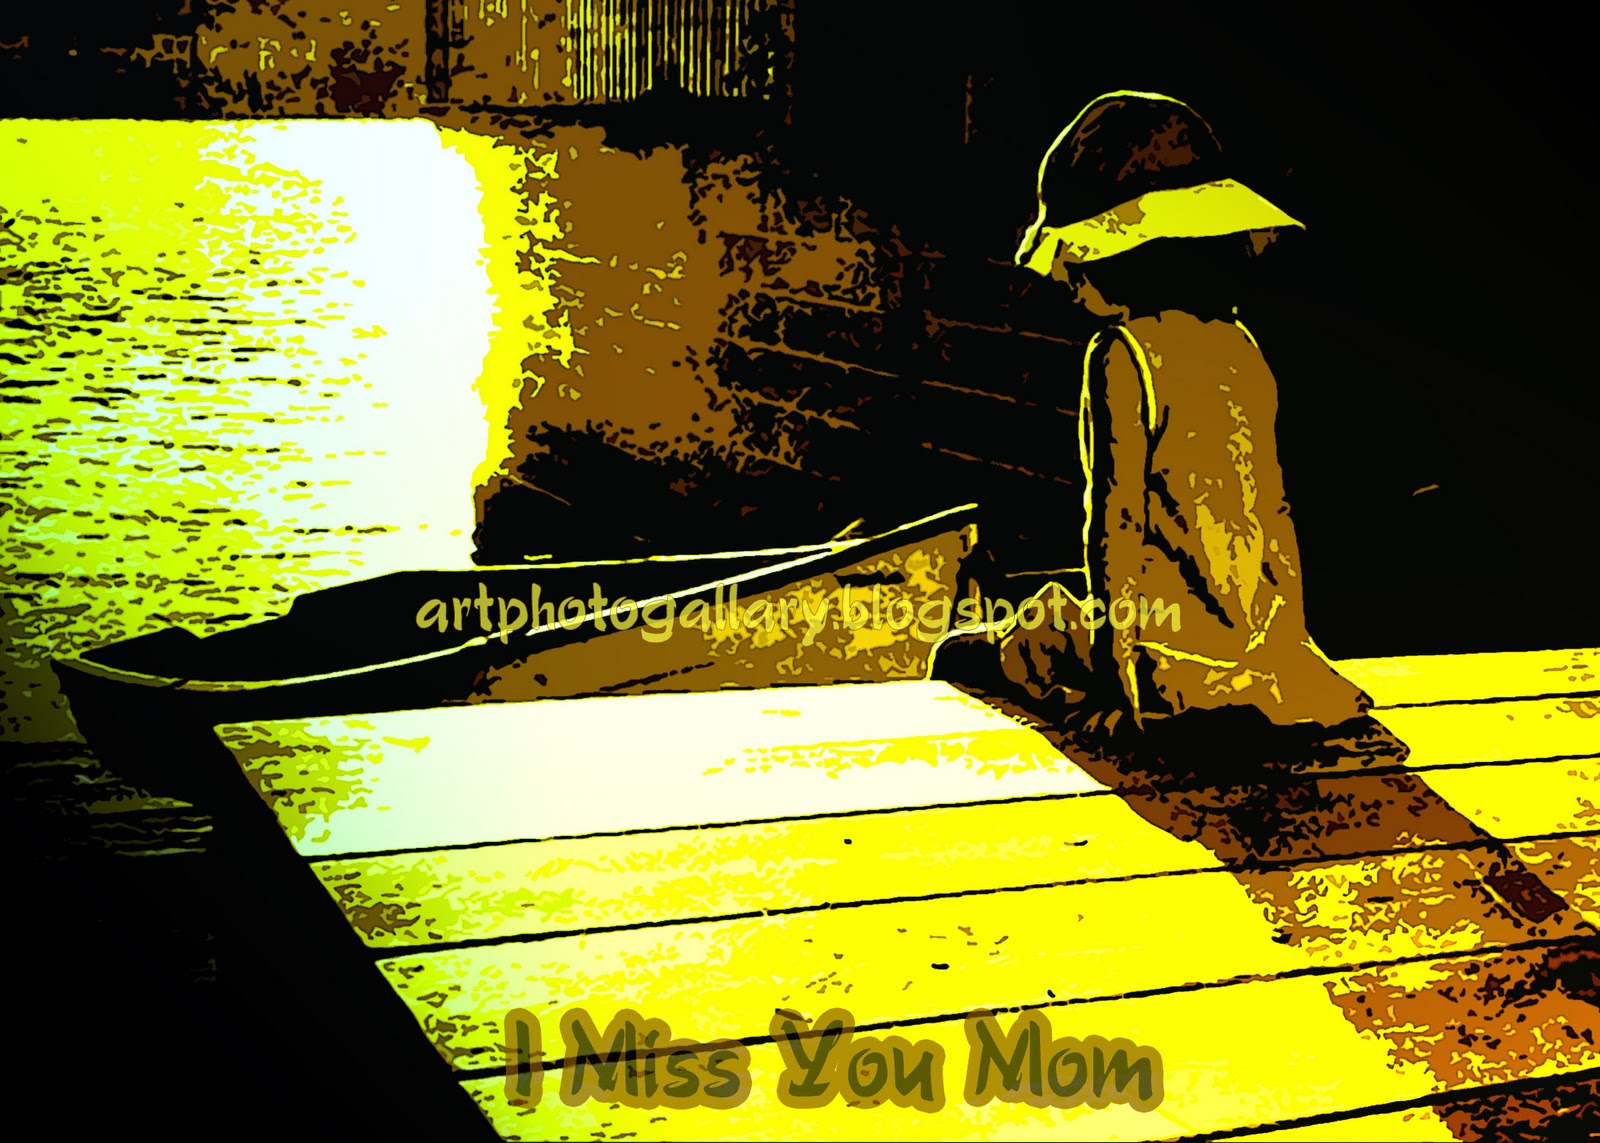 http://4.bp.blogspot.com/_X7LSwB5ybYw/TS1Dzn4wKDI/AAAAAAAAAa4/HKUjdL2wtdA/s1600/i+miss+you+mom2.jpg